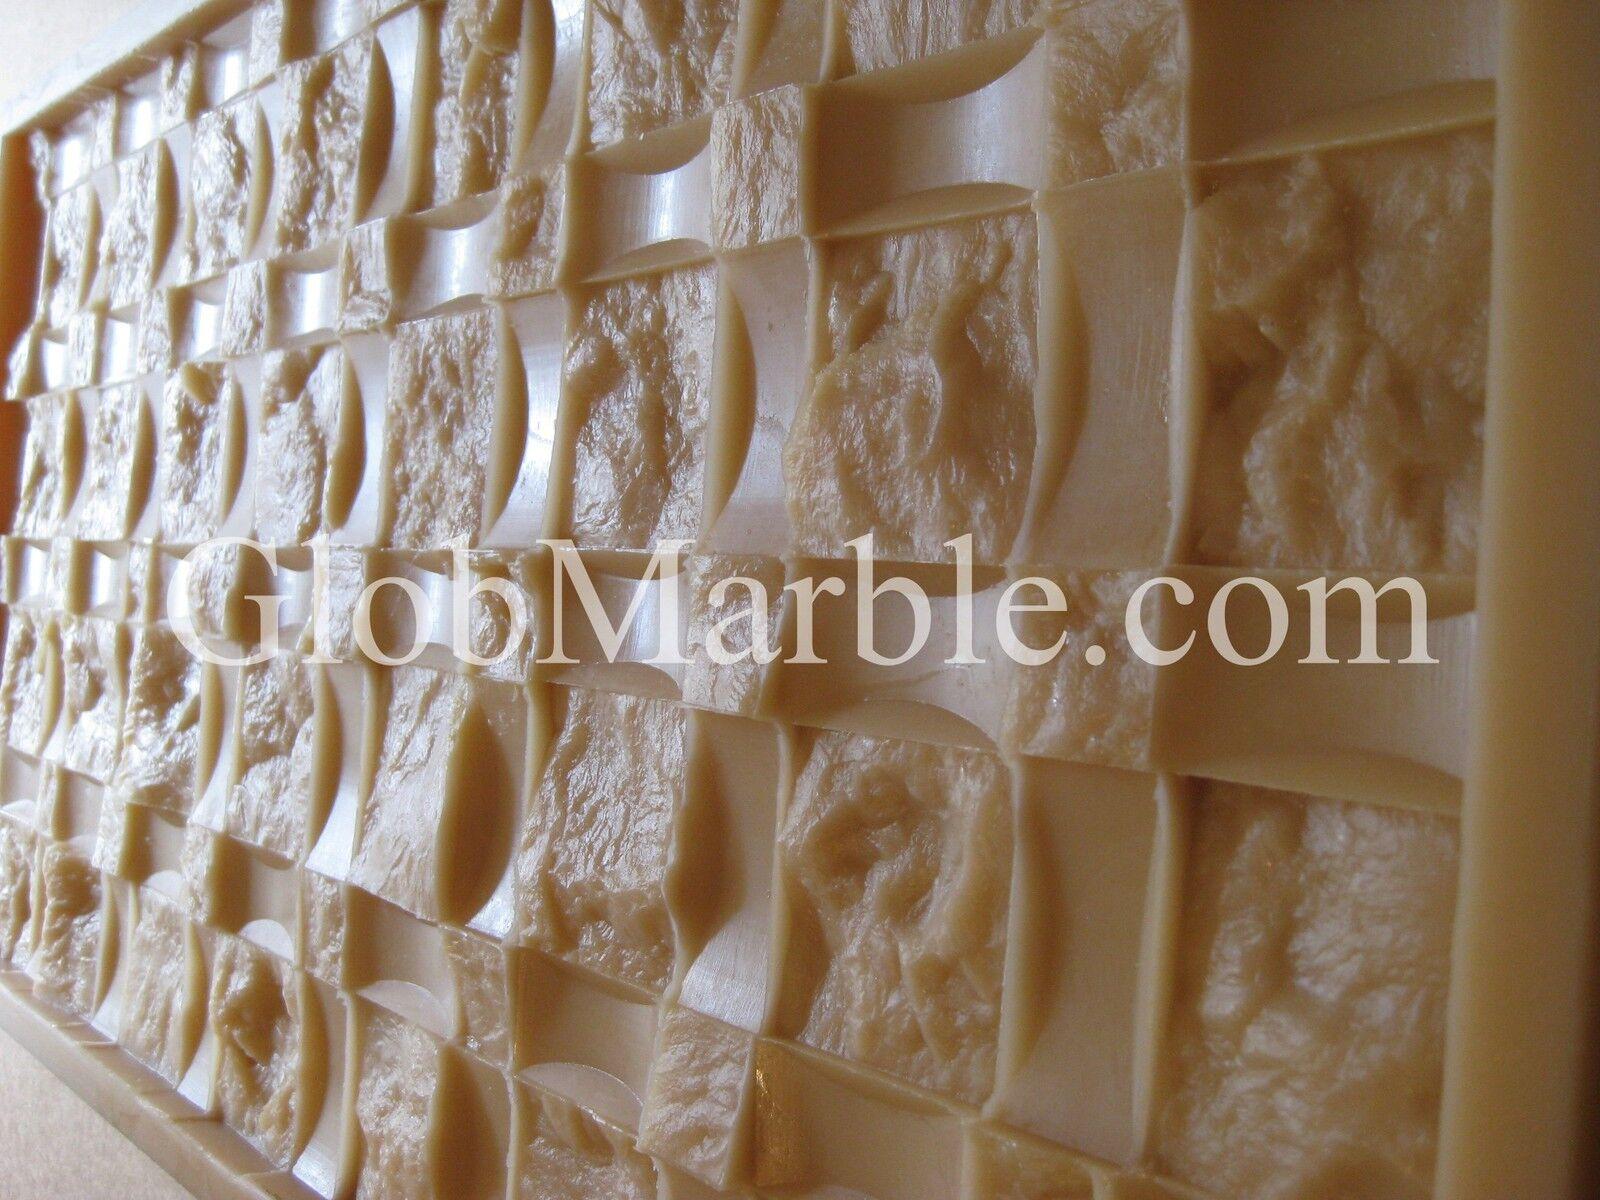 GlobMarble Stone Molds